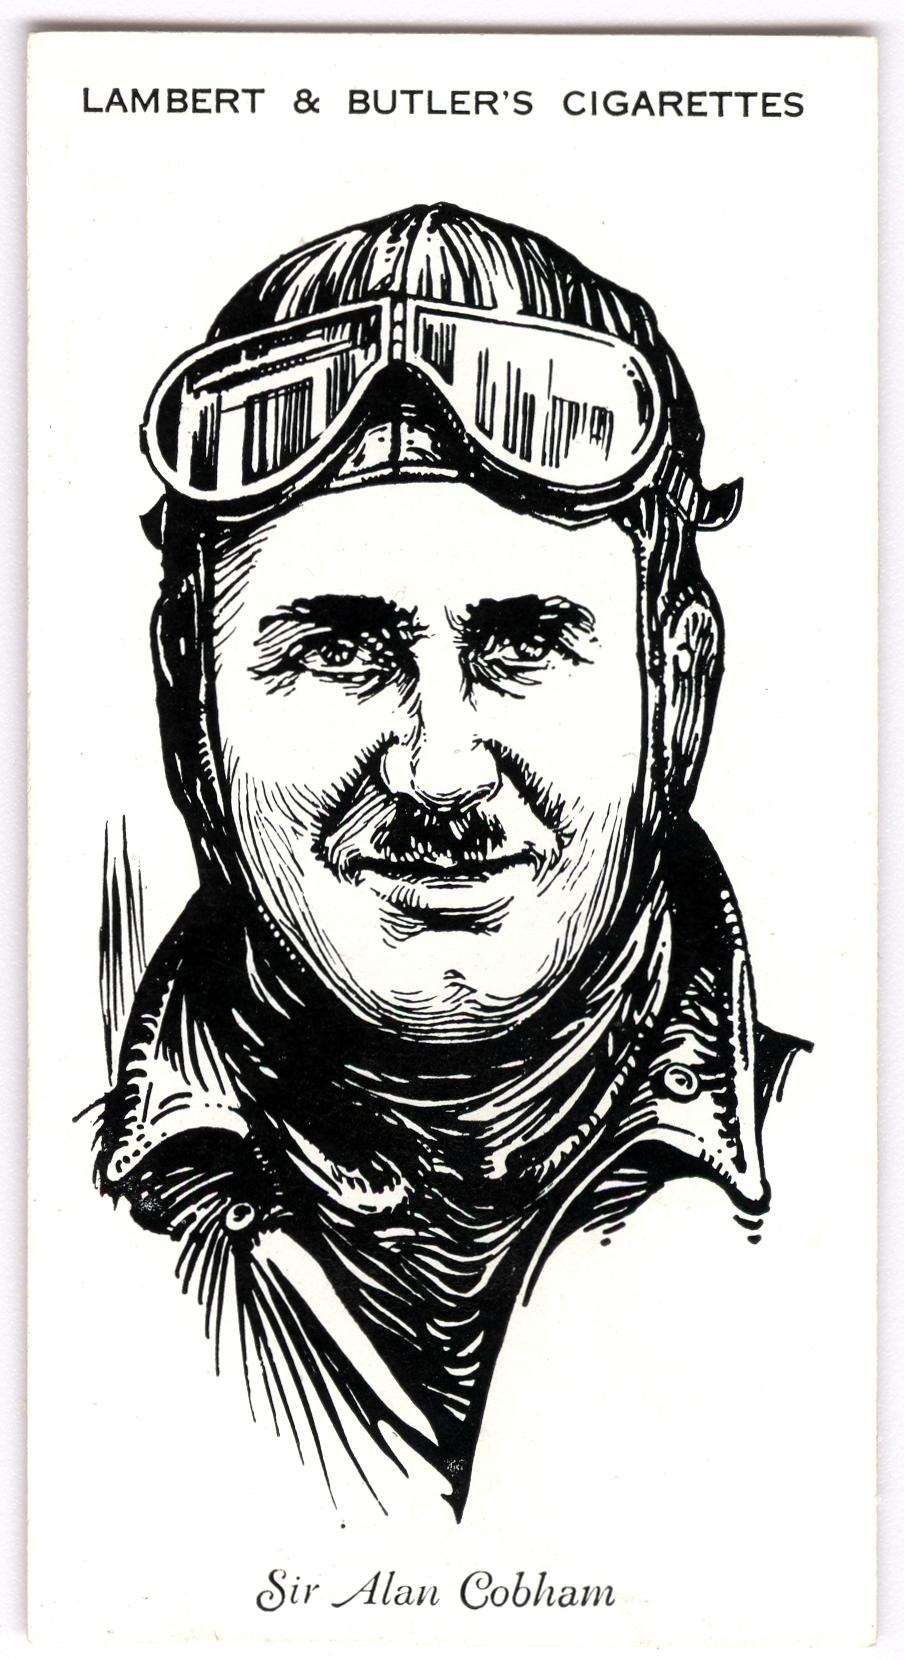 1935 Famous British Airmen & Airwomen, L8-46, The Imperial